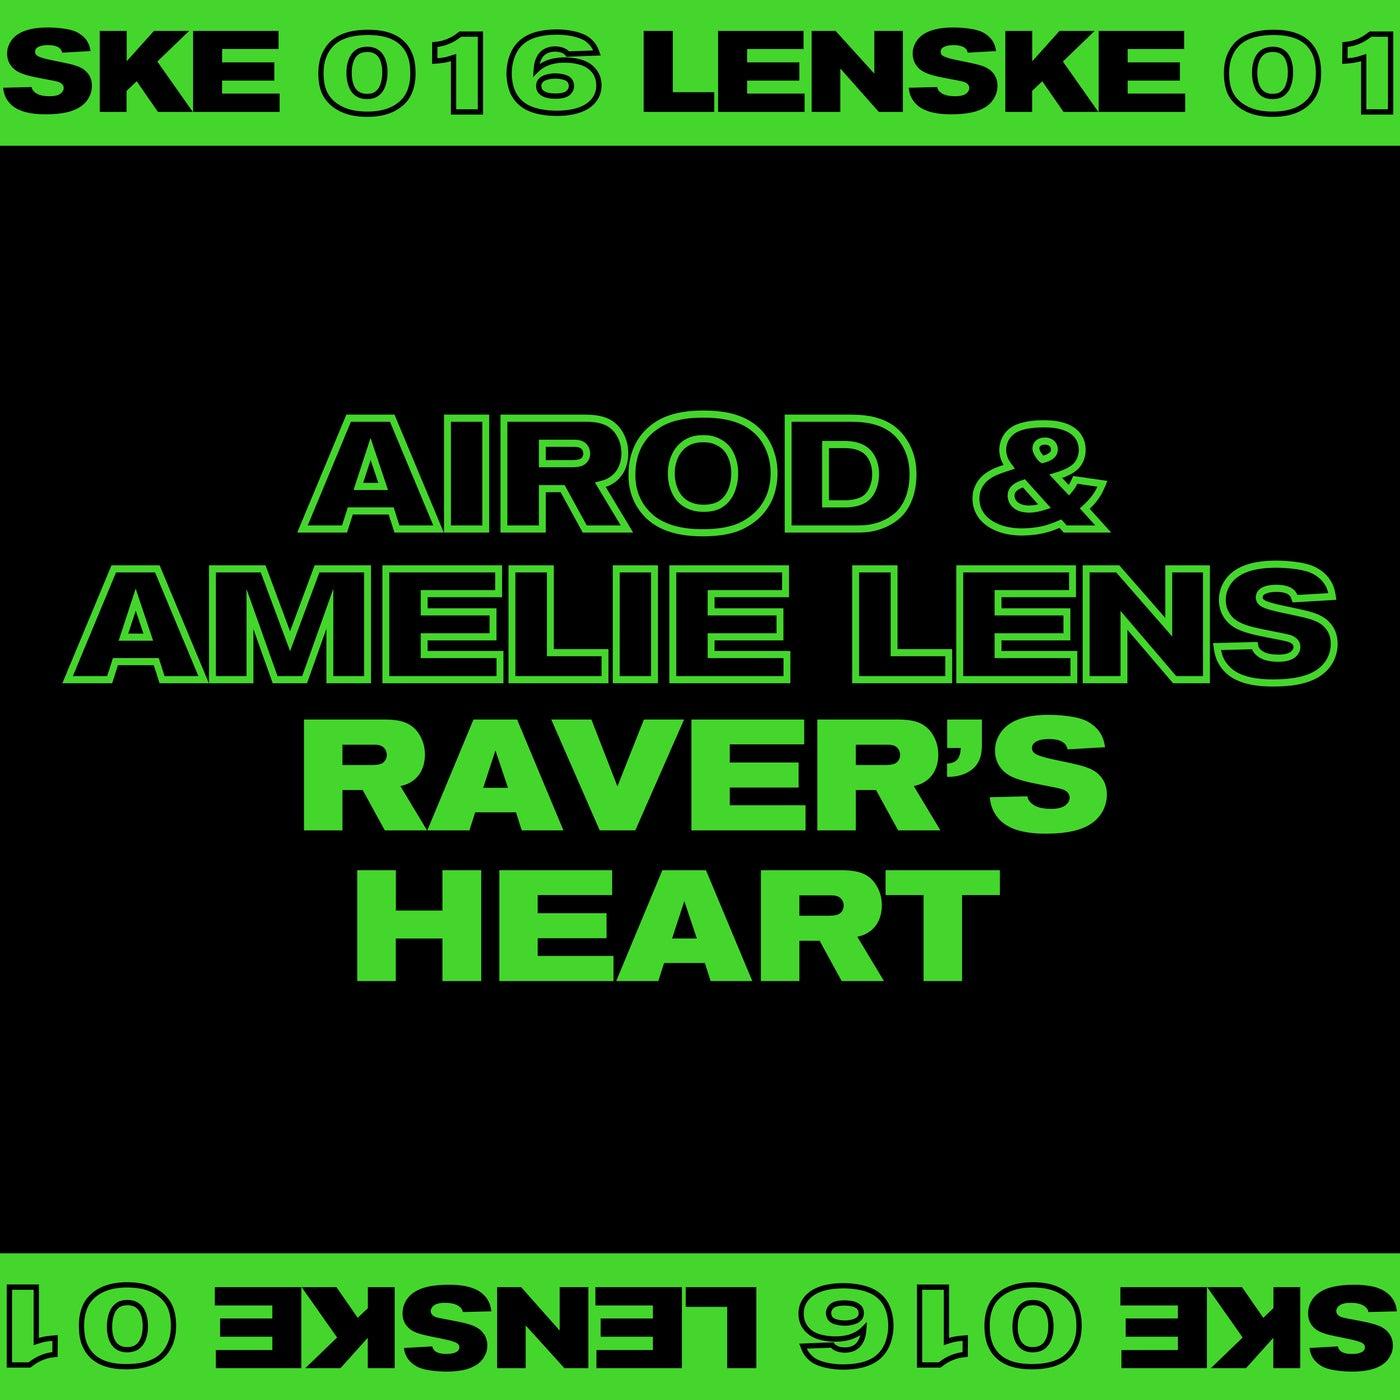 Raver's heart (Original Mix)